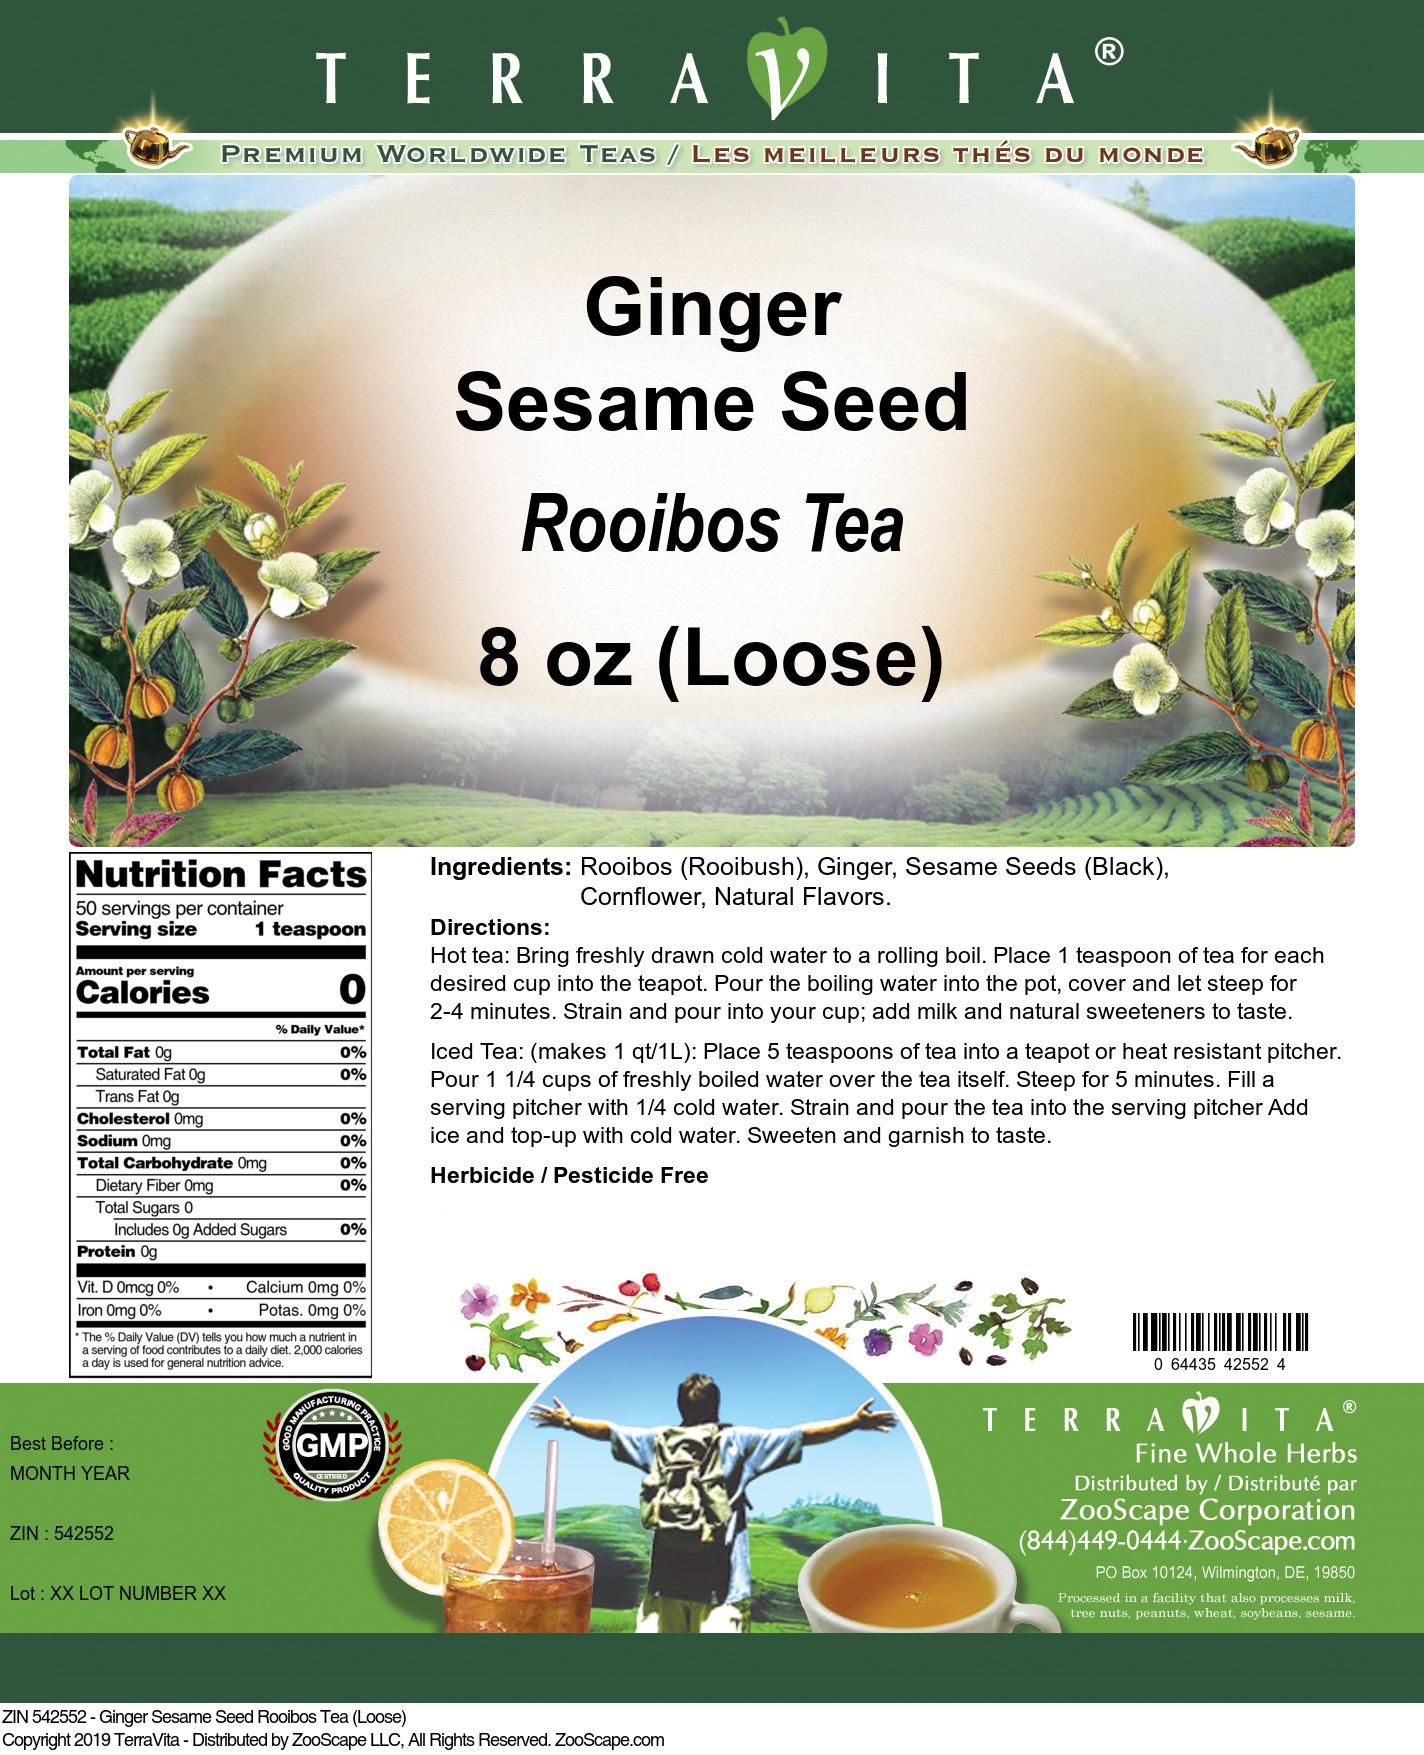 Ginger Sesame Seed Rooibos Tea